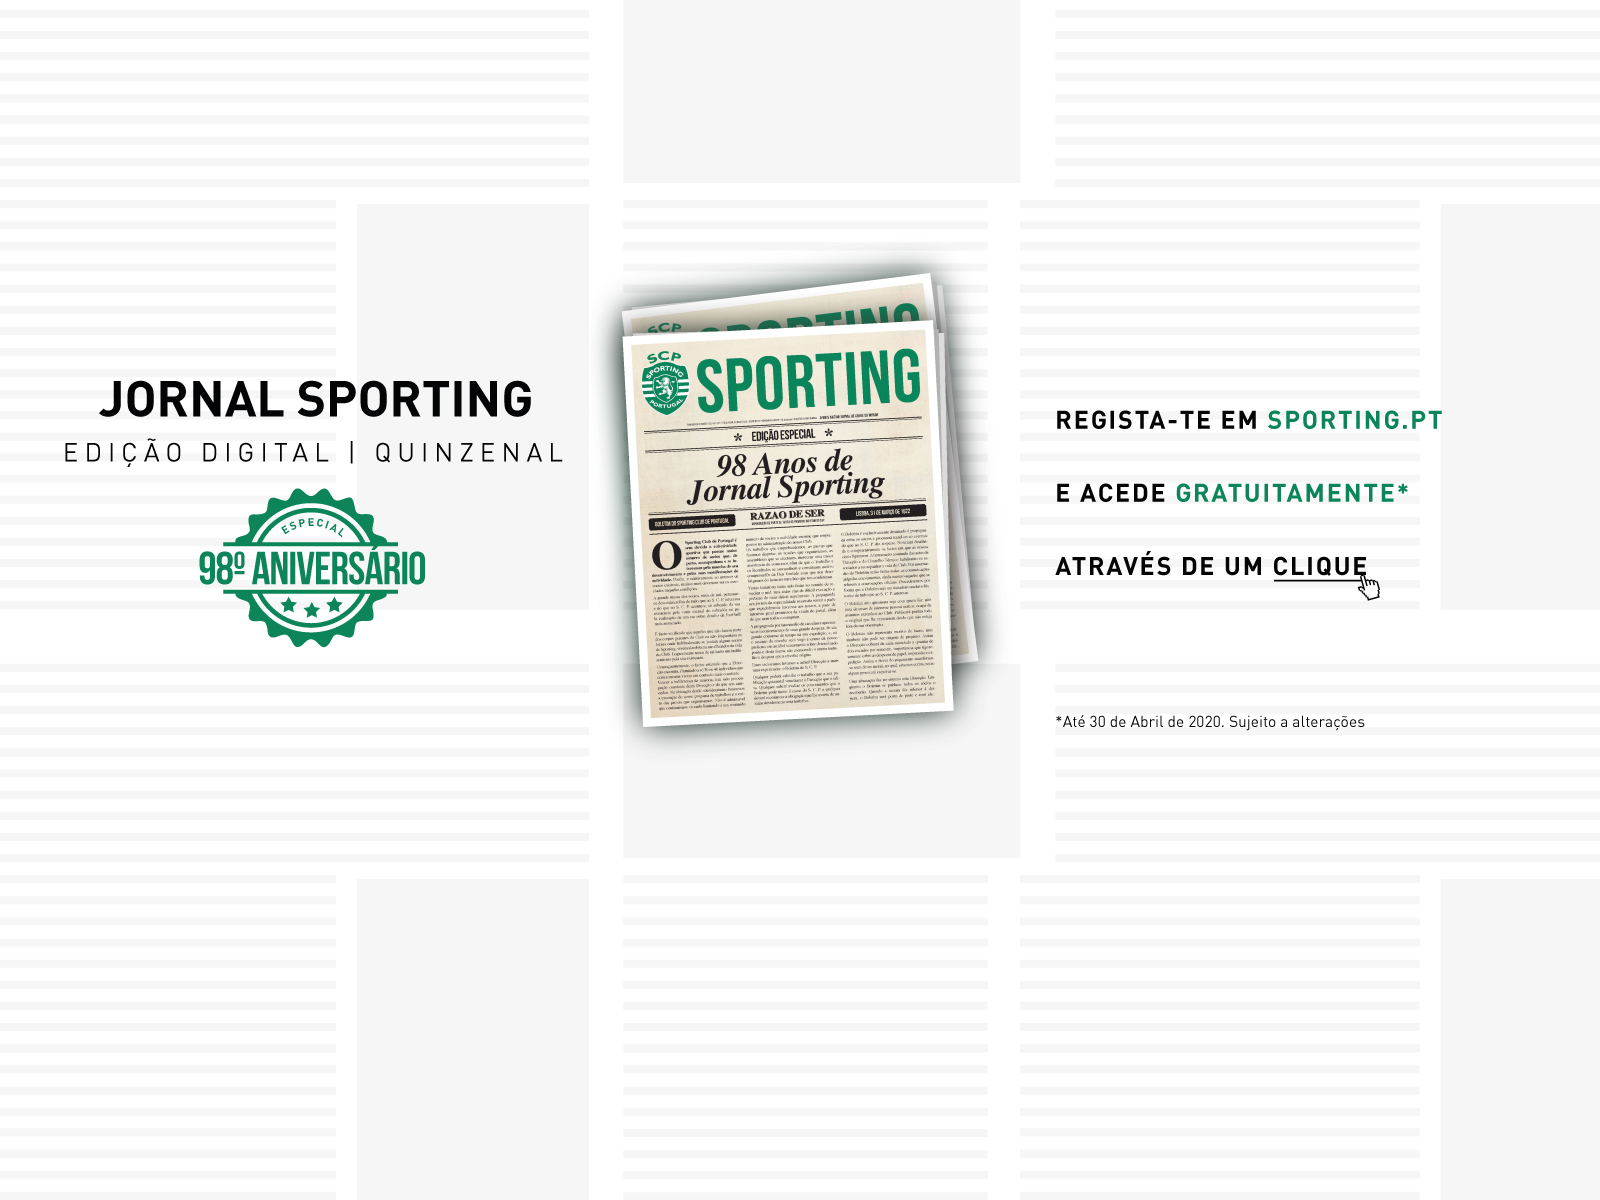 https://scpconteudos.pt/sites/default/files/revslider/image/Jornal-Sporting-Gratuito_Banner-HP_1.JPG